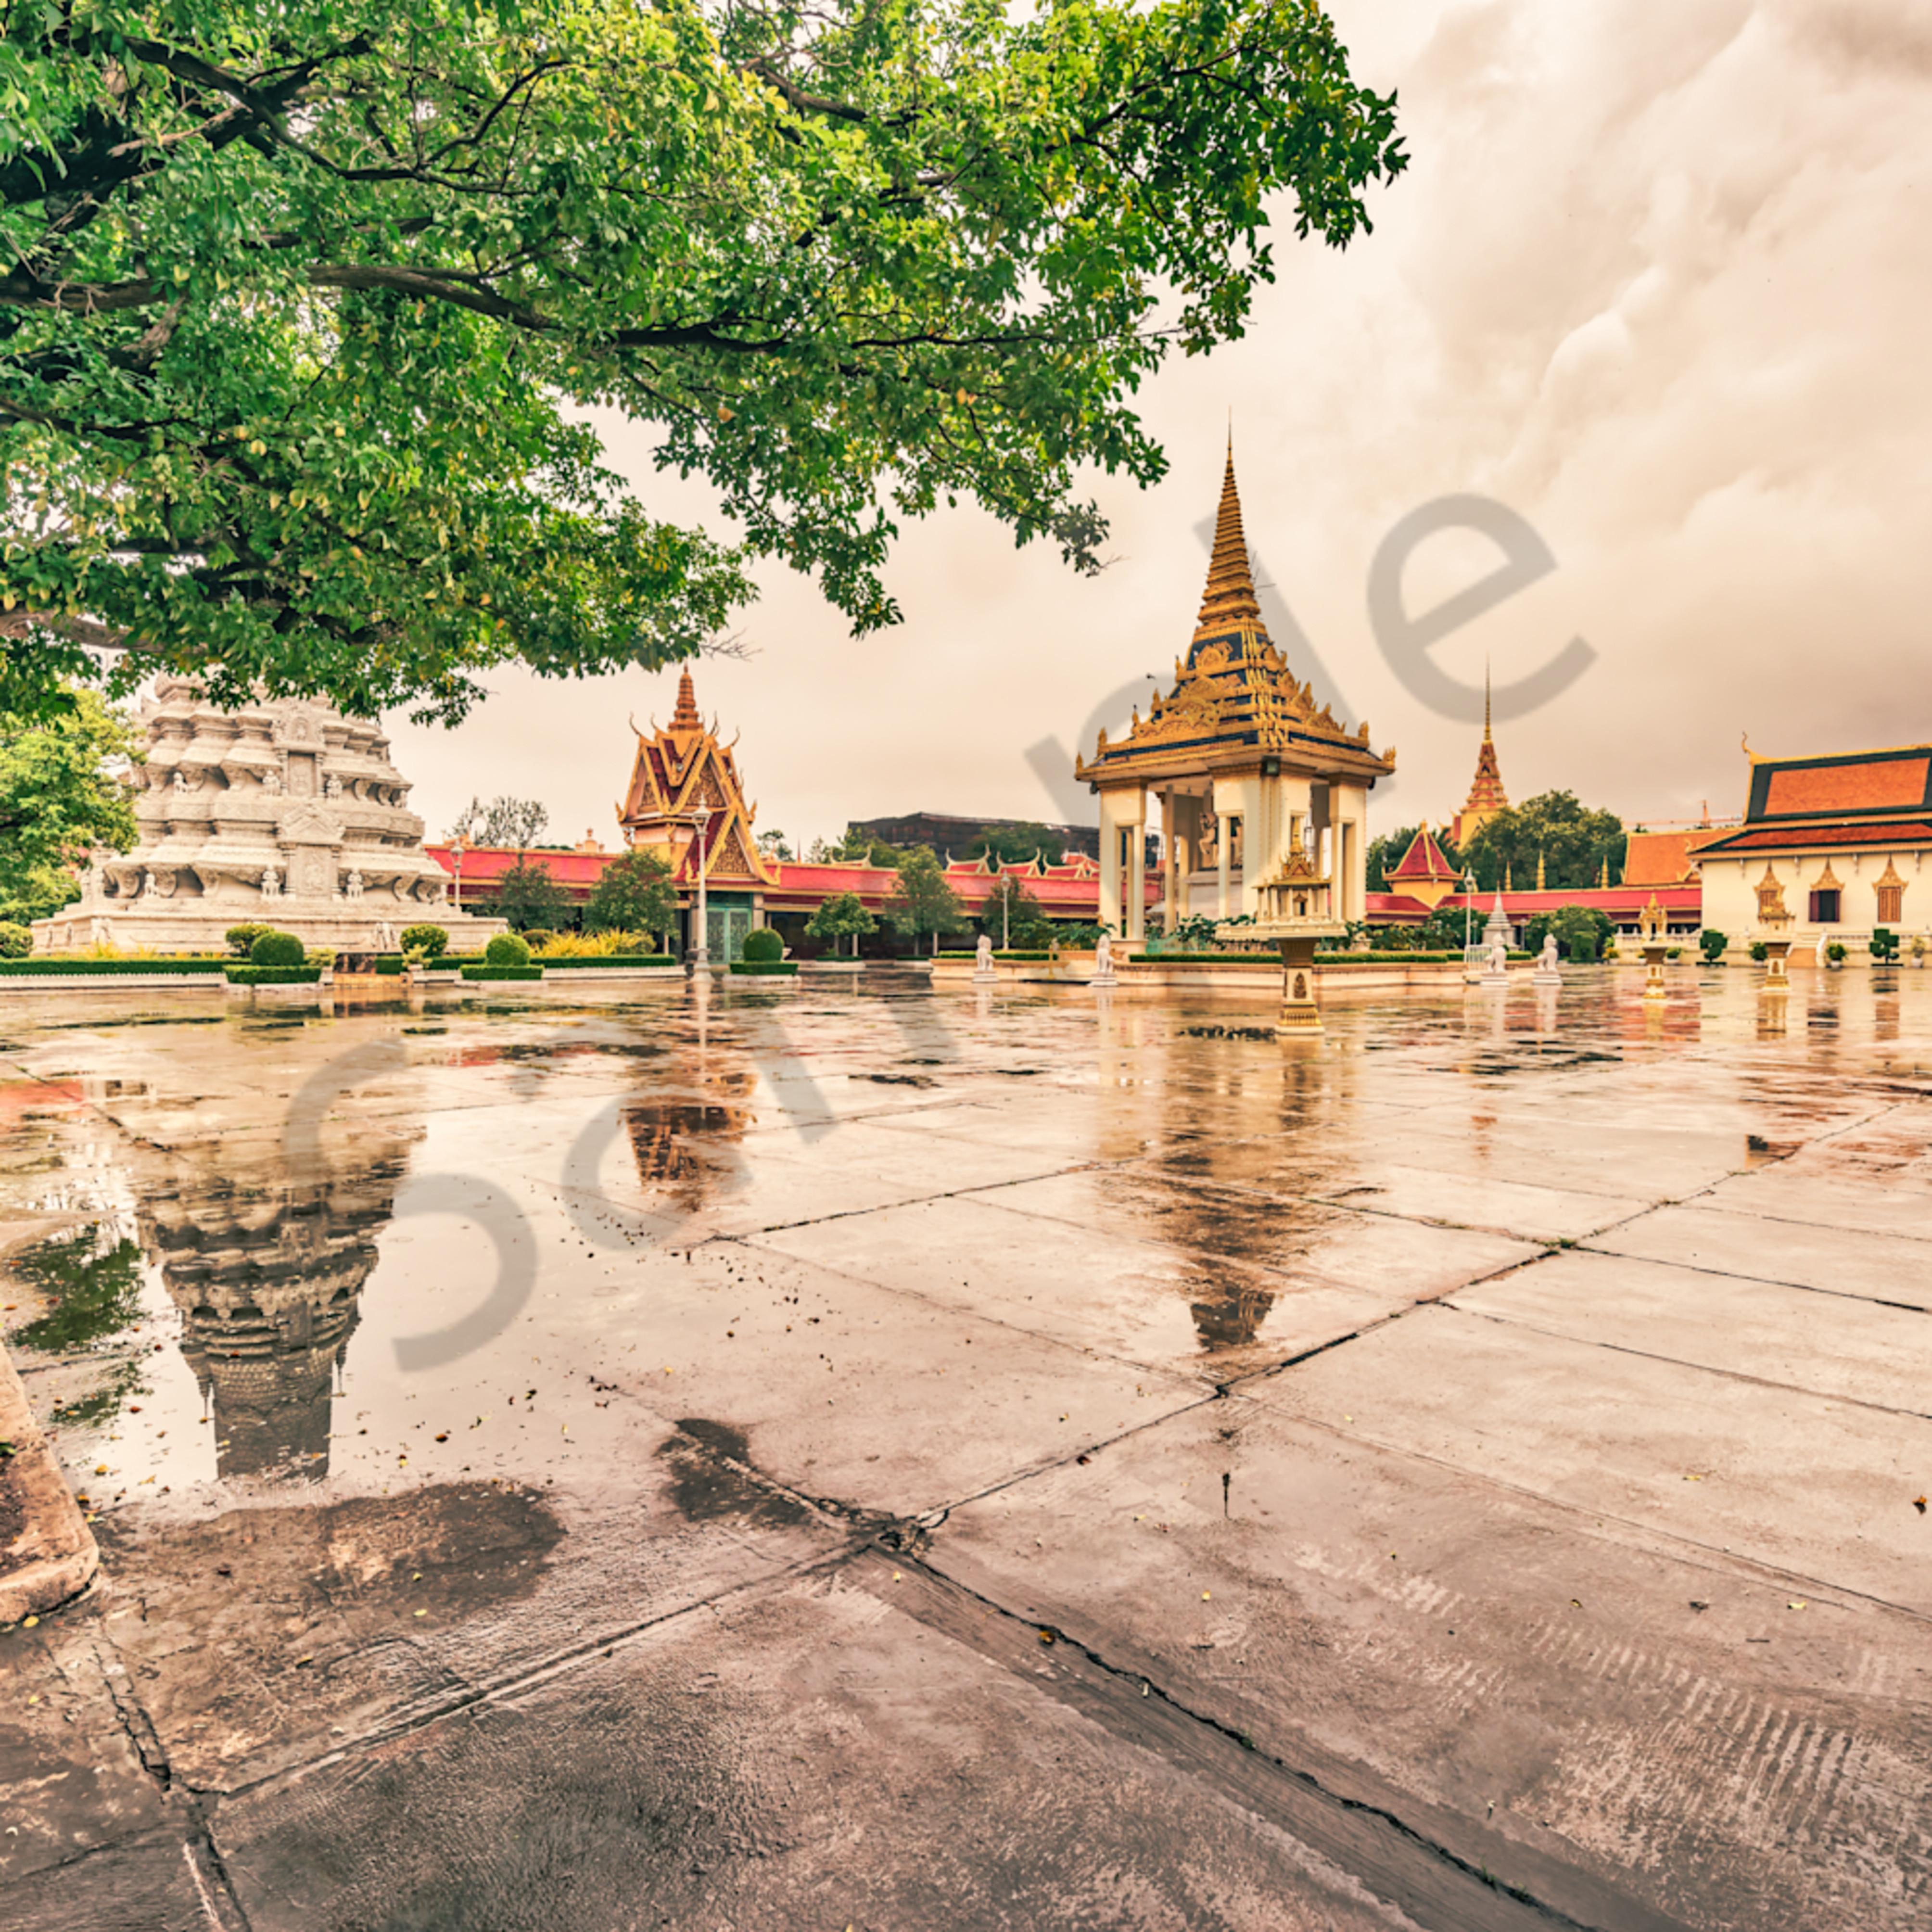 The royal palace in phnom penh v7ou8b